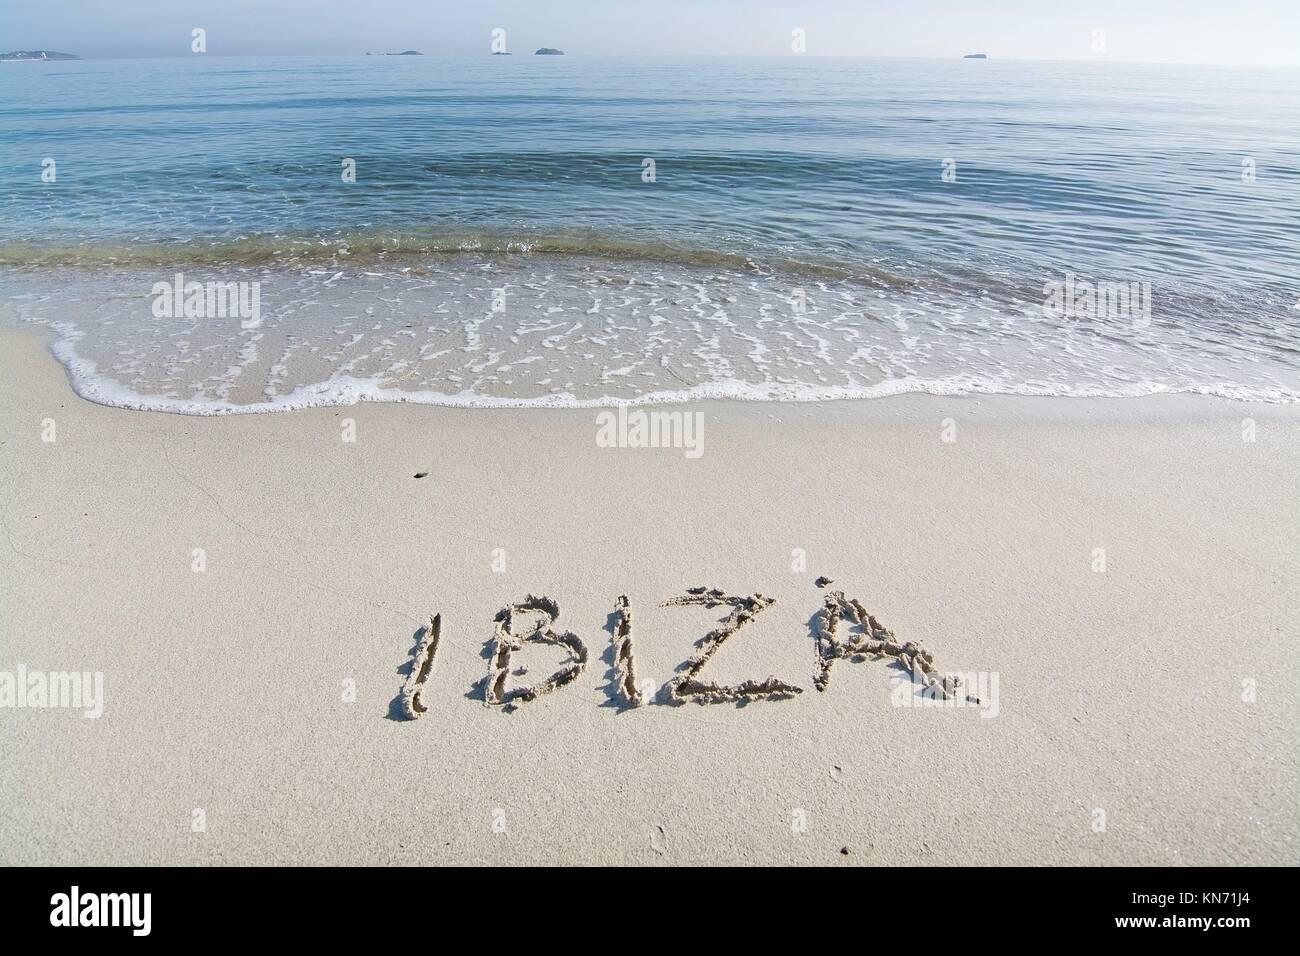 Ibiza written in sand on beach with wave in Ibiza, Balearic islands, Spain. - Stock Image